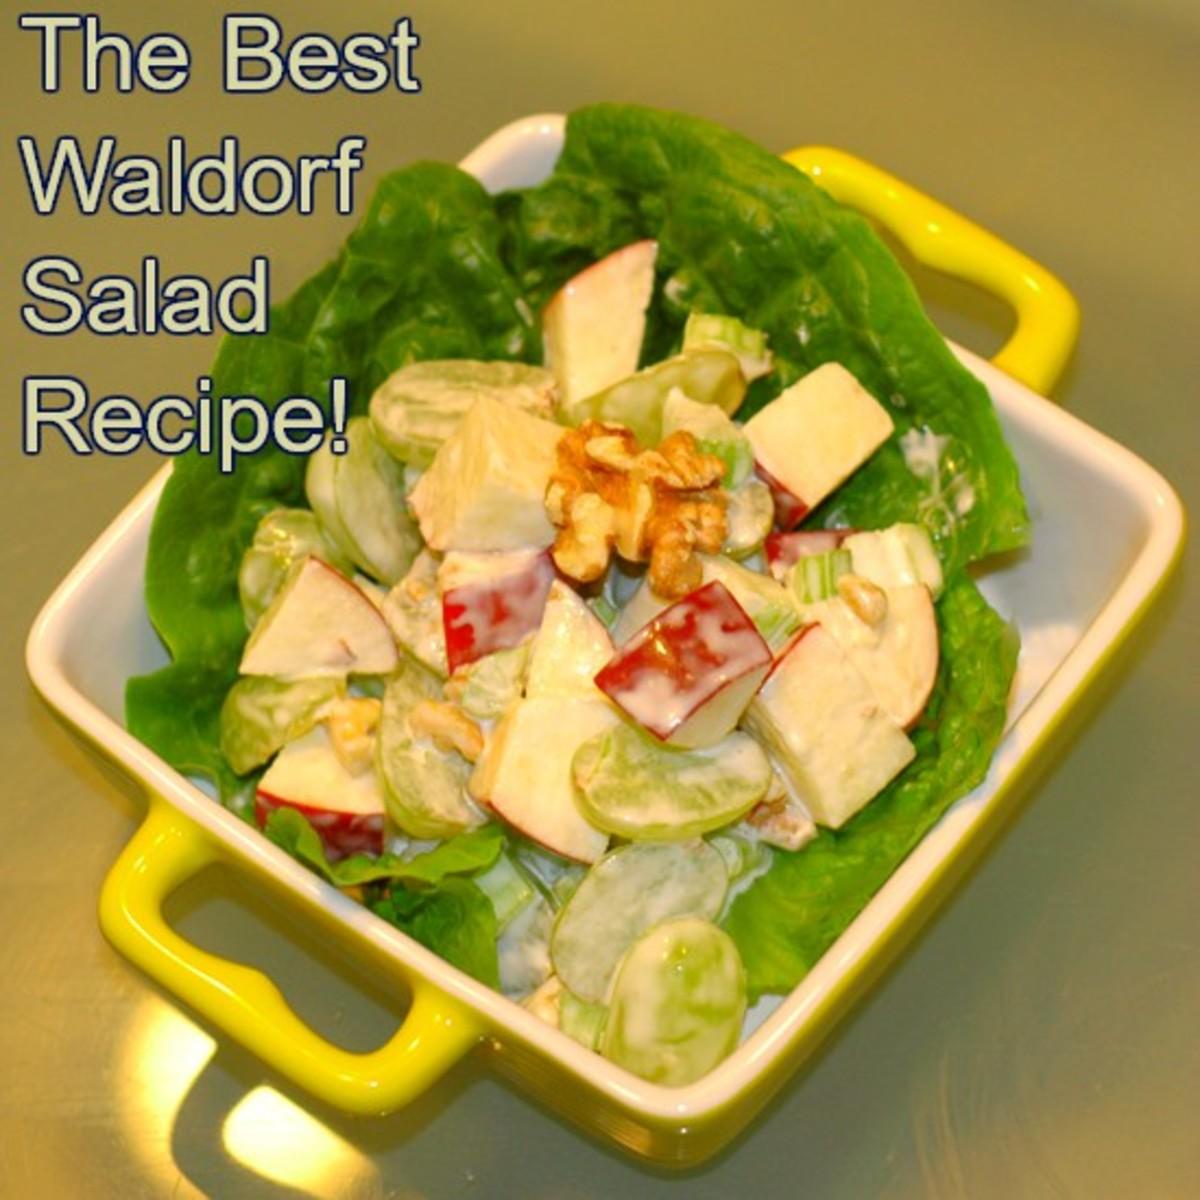 Waldorf Salad Recipe: The Simple, Sophisticated Fruit Salad